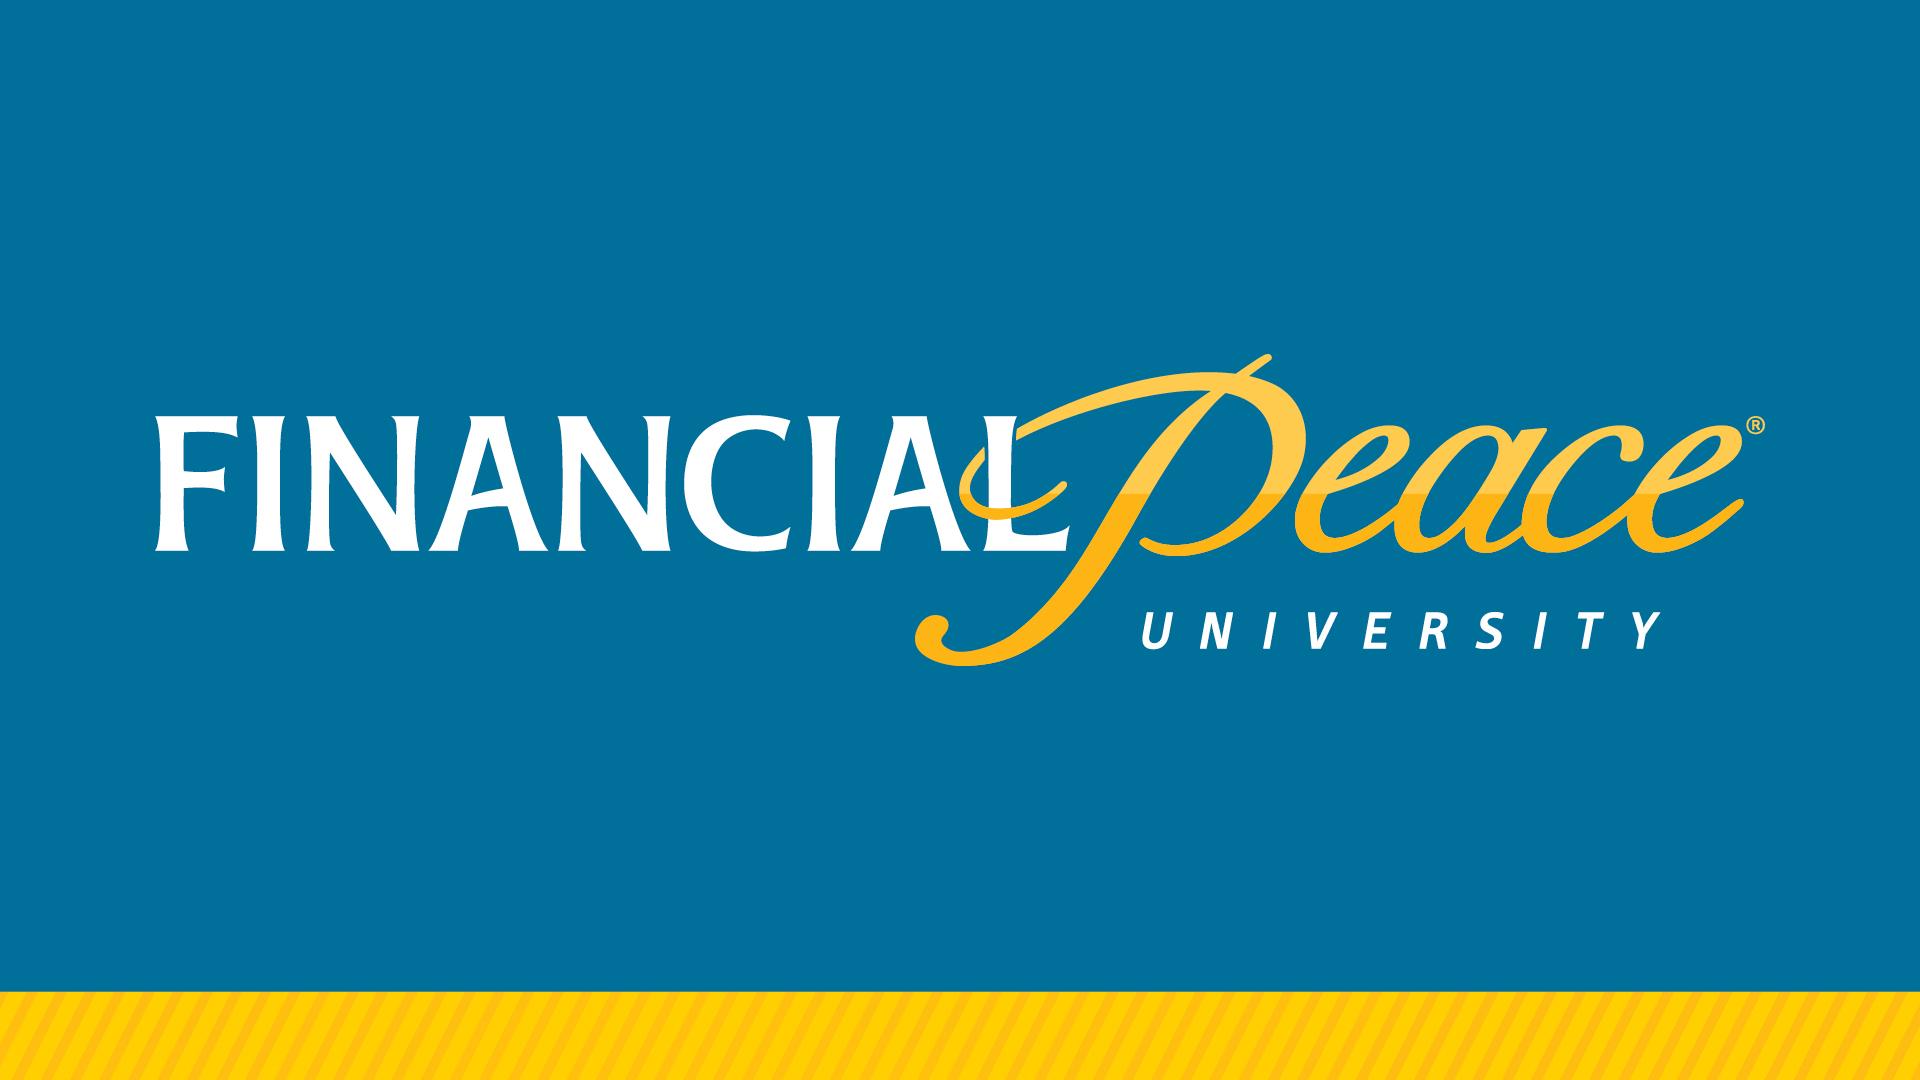 Financial peace slide large logo